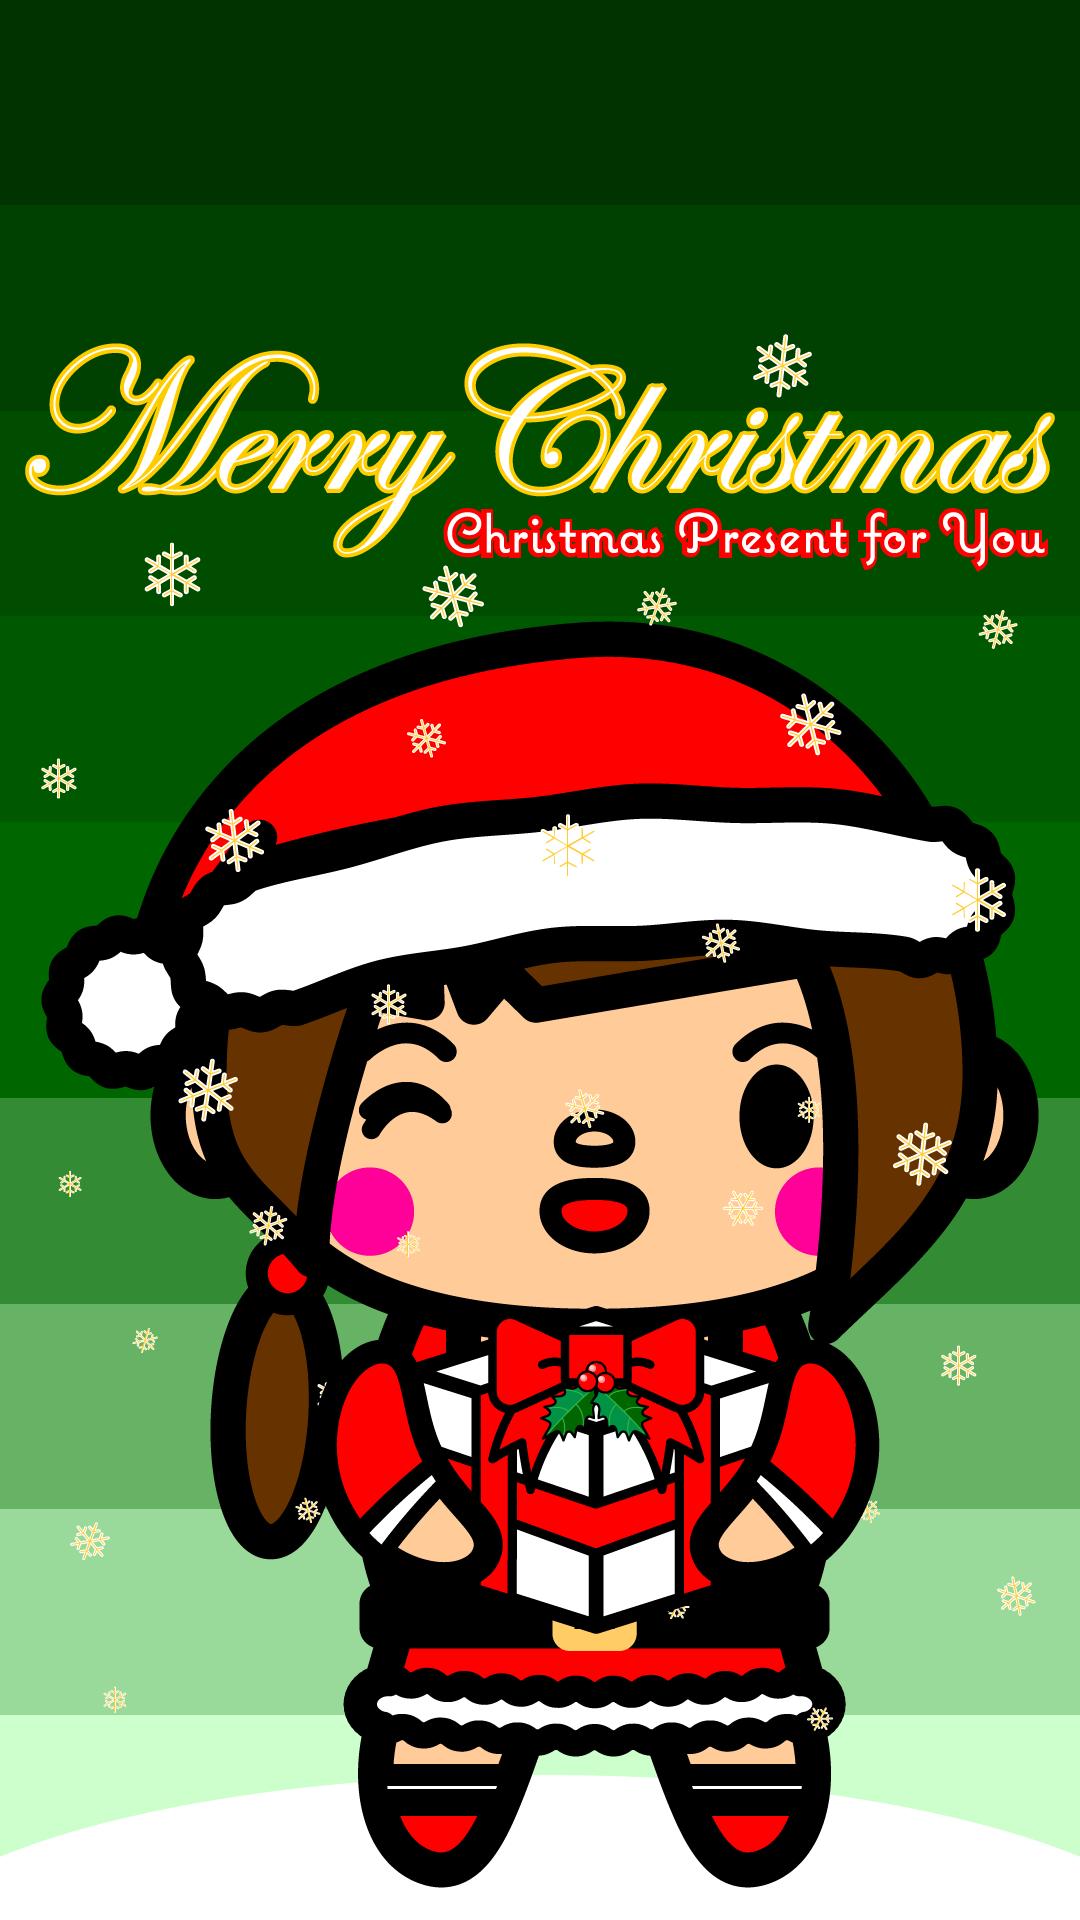 wallpaper6_christmas-santawoman-green-iphone